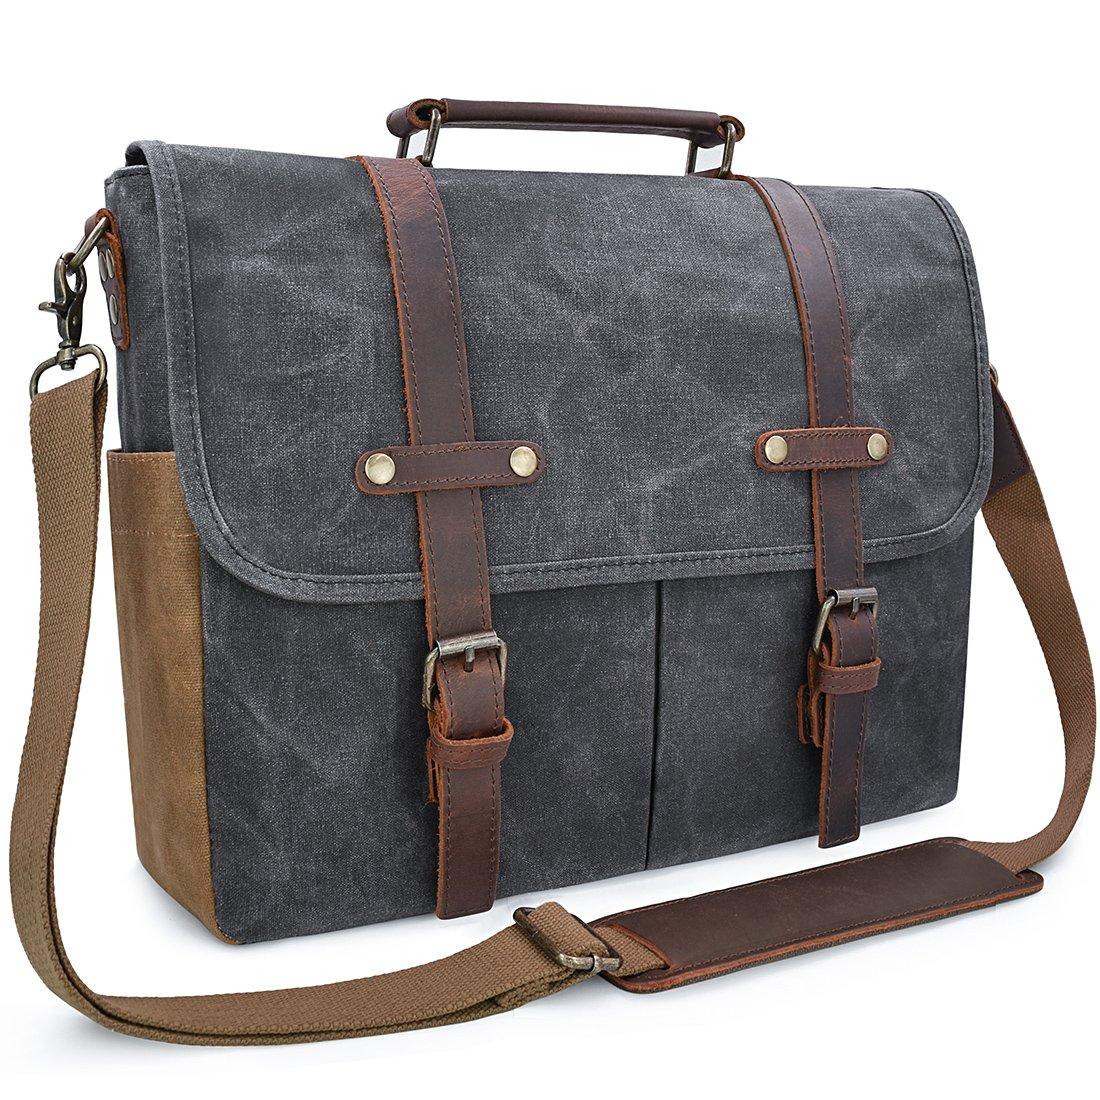 Buy Engel Transit Bag Grey in Cheap Price on m alibaba com